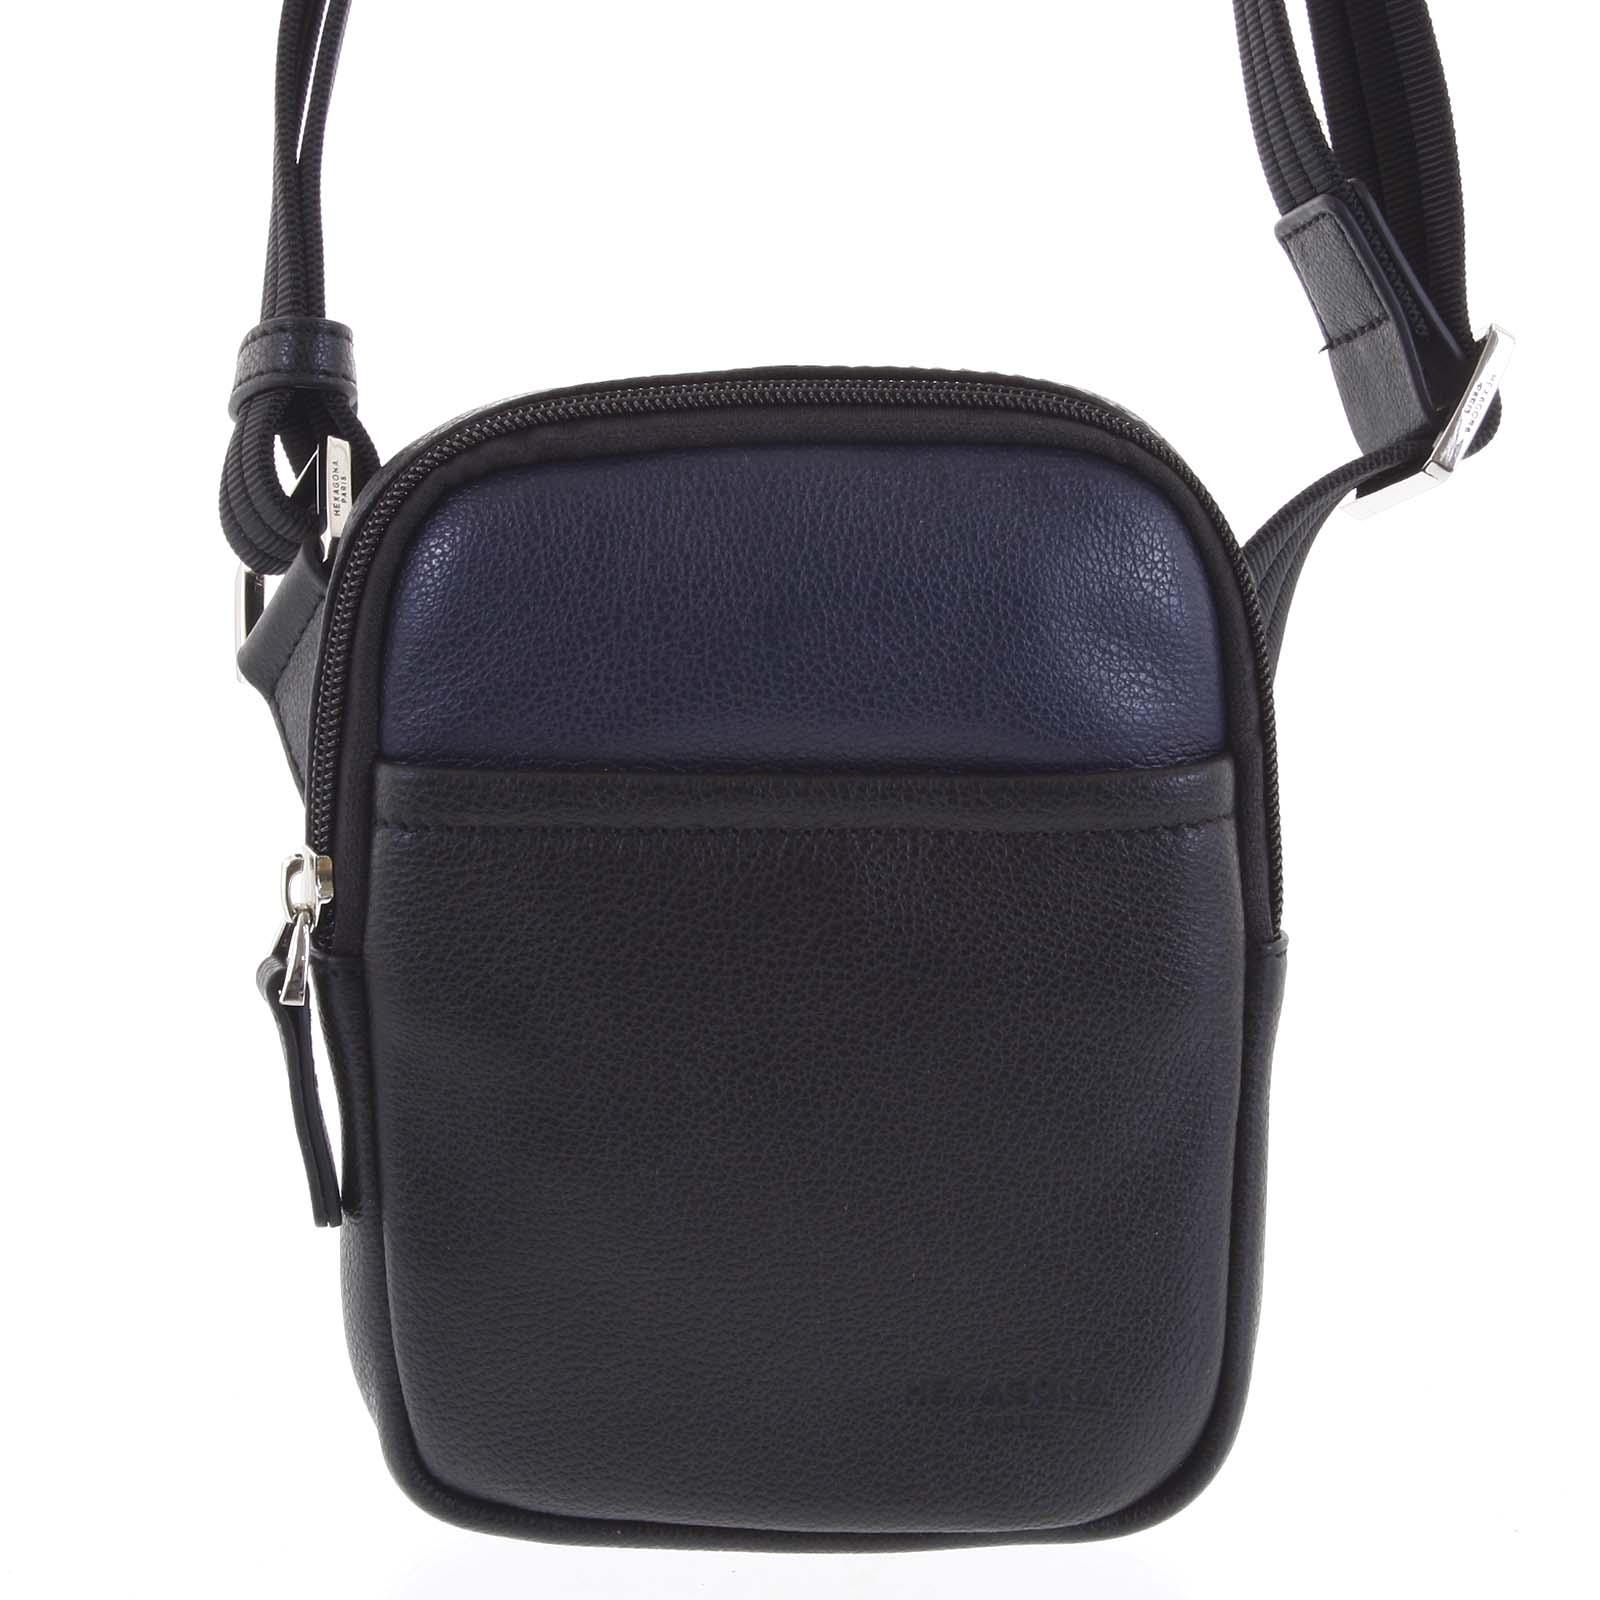 Pánská kožená taška na doklady černo modrá - Hexagona Monday